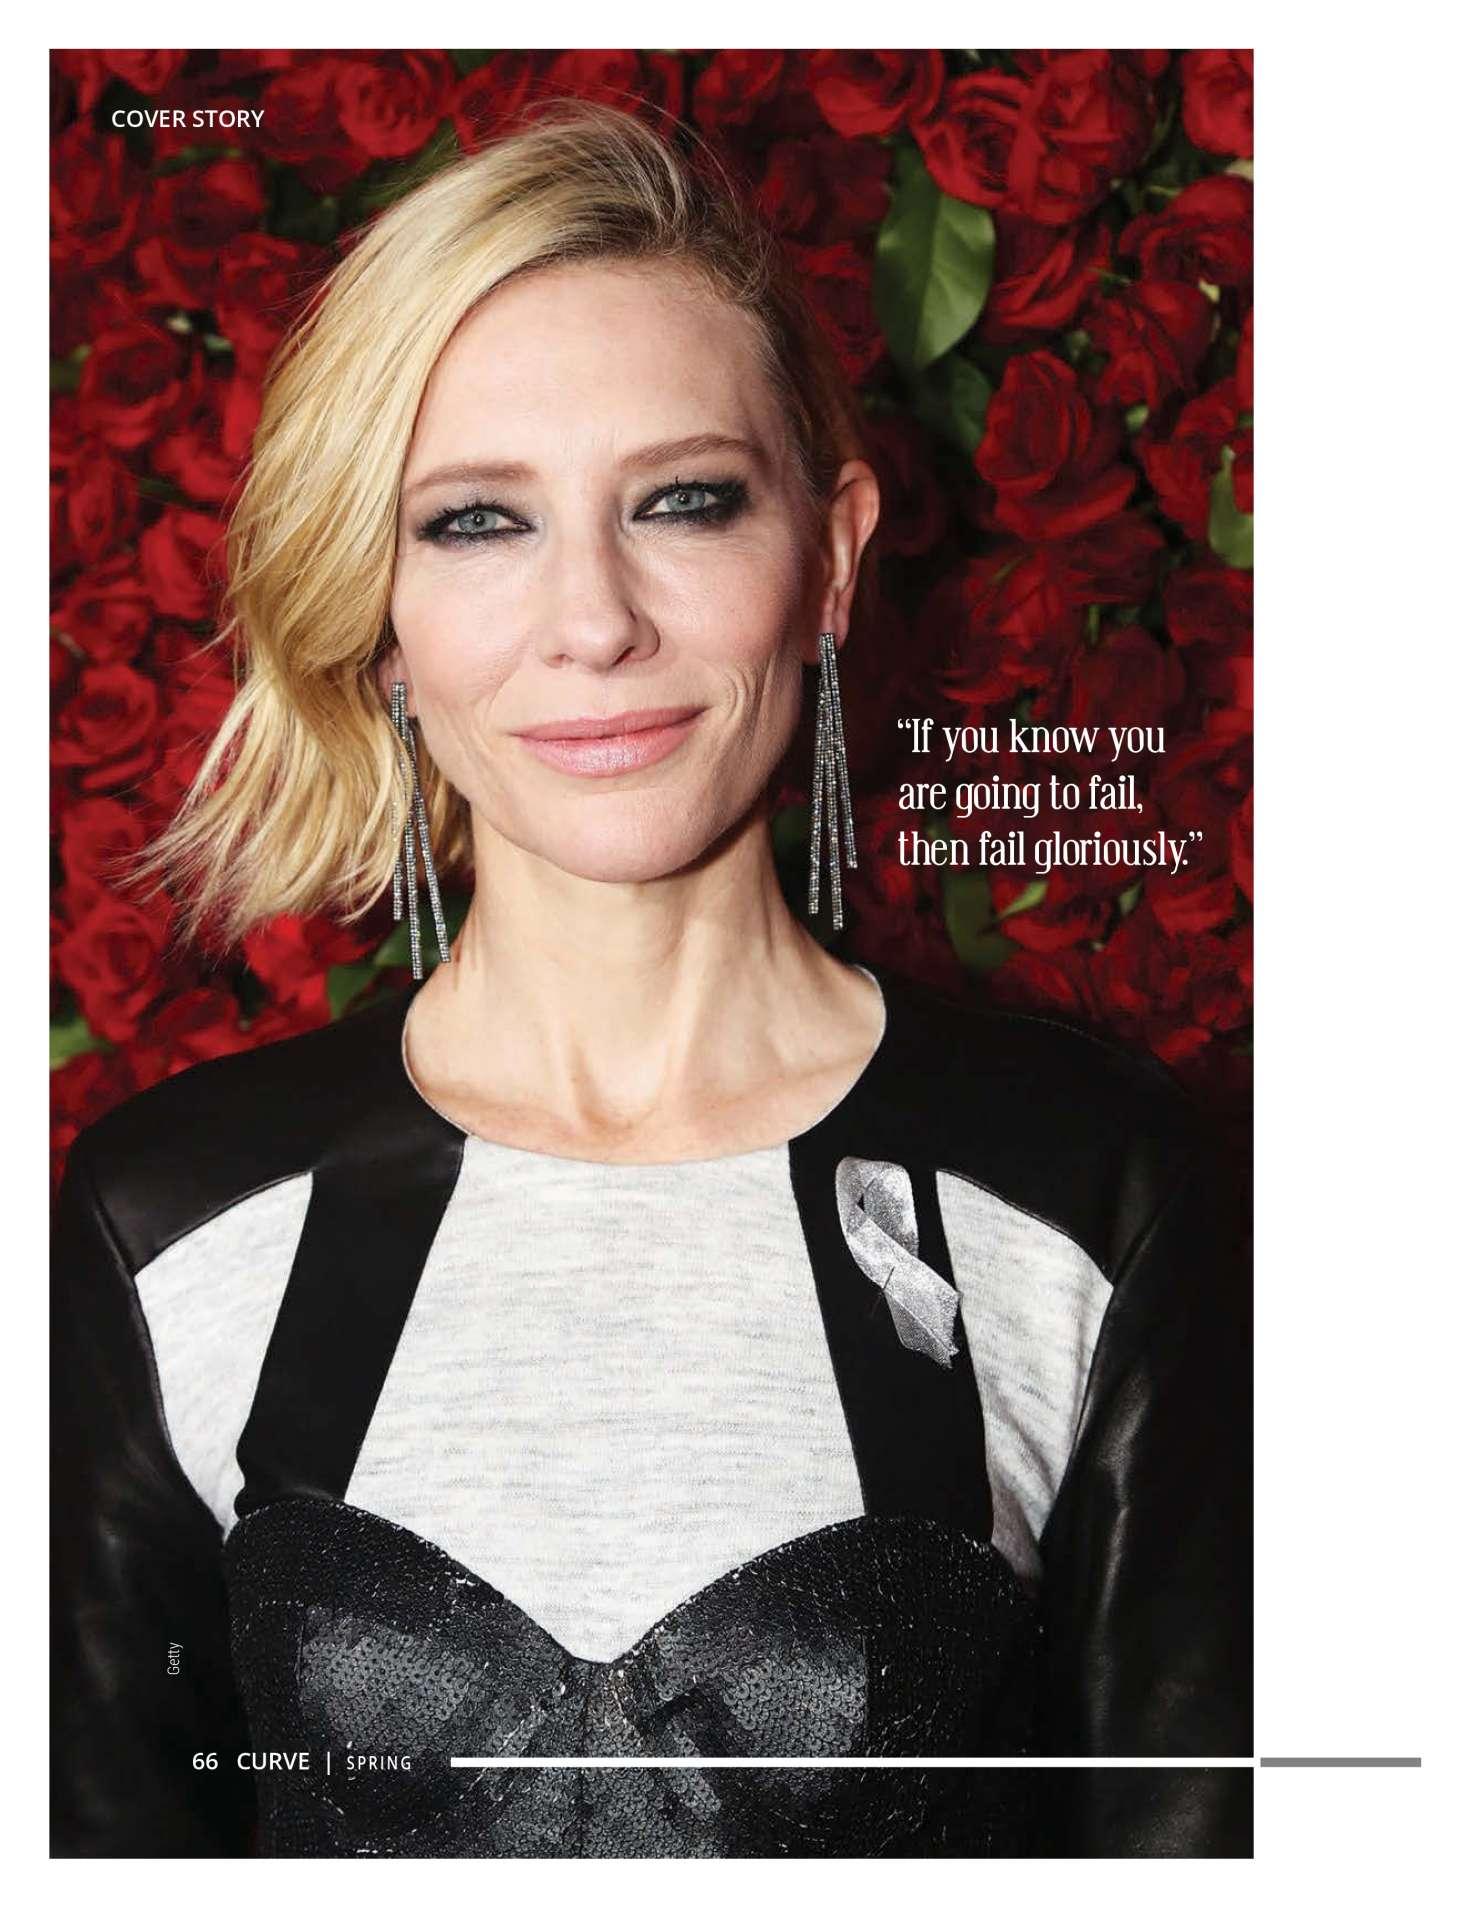 Cate Blanchett - Curve Magazine (Spring 2018)